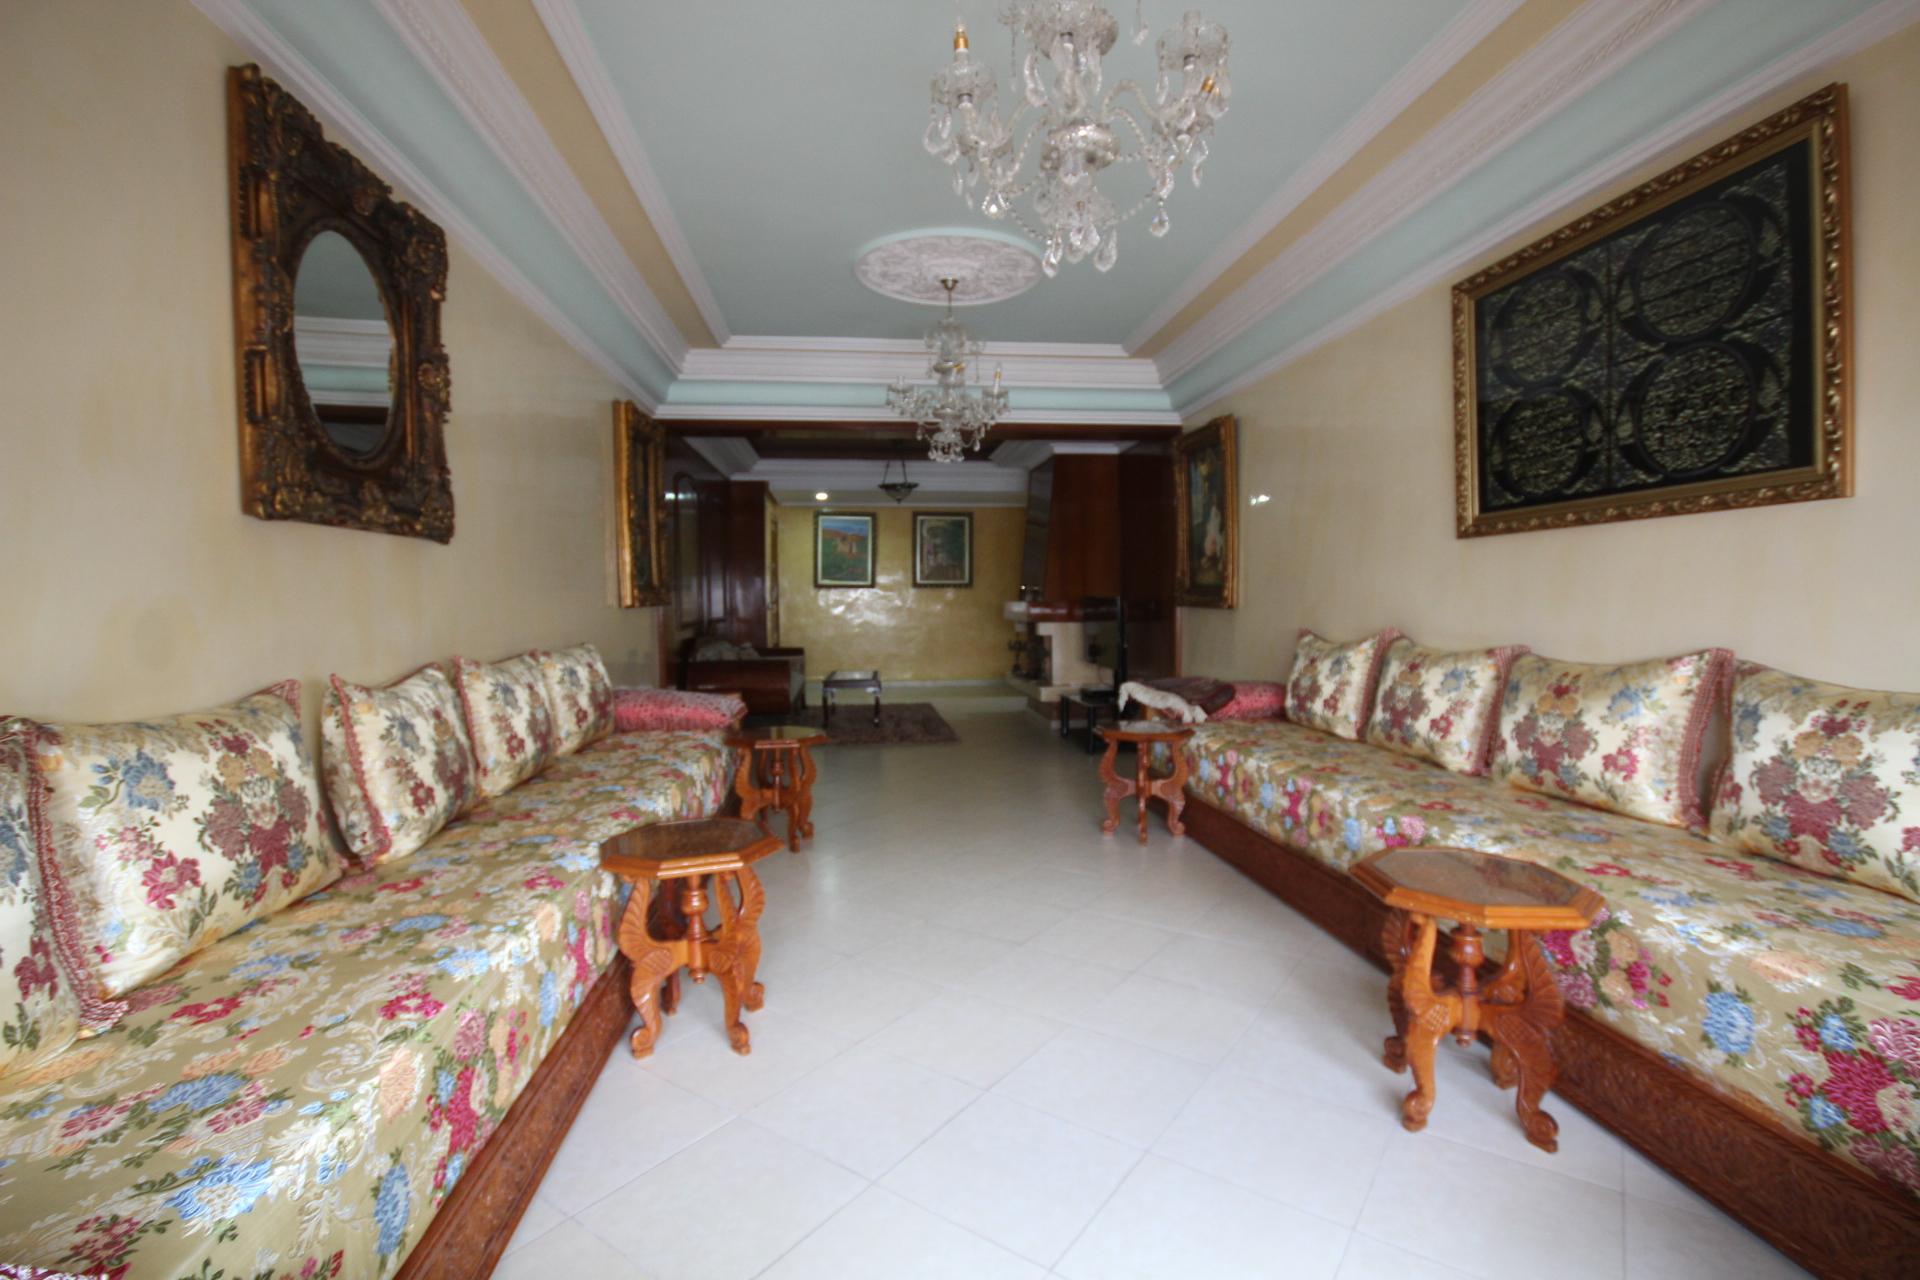 Maroc, Casablanca, Maarif Extension (Bir Anzarane) à acheter parfait et lumineux logement familial de 163 m²